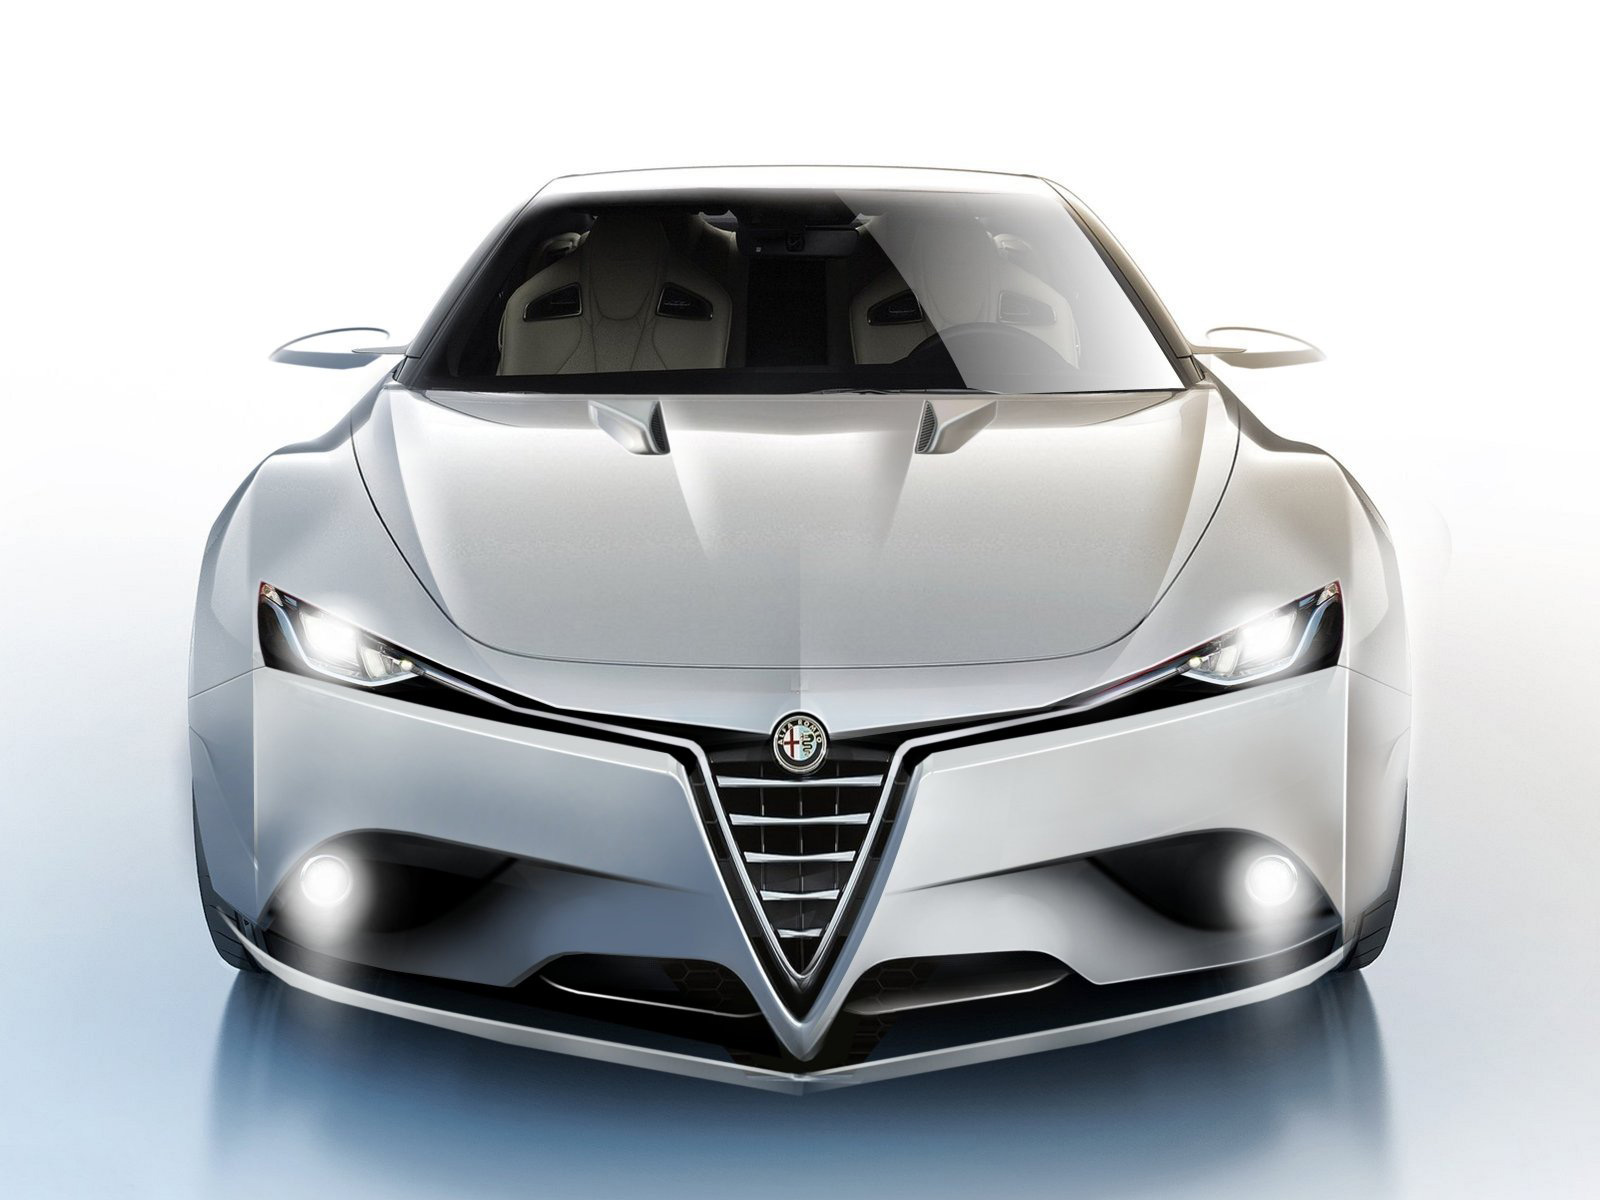 Alfa-Romeo-Giulia-Concept-front.jpg